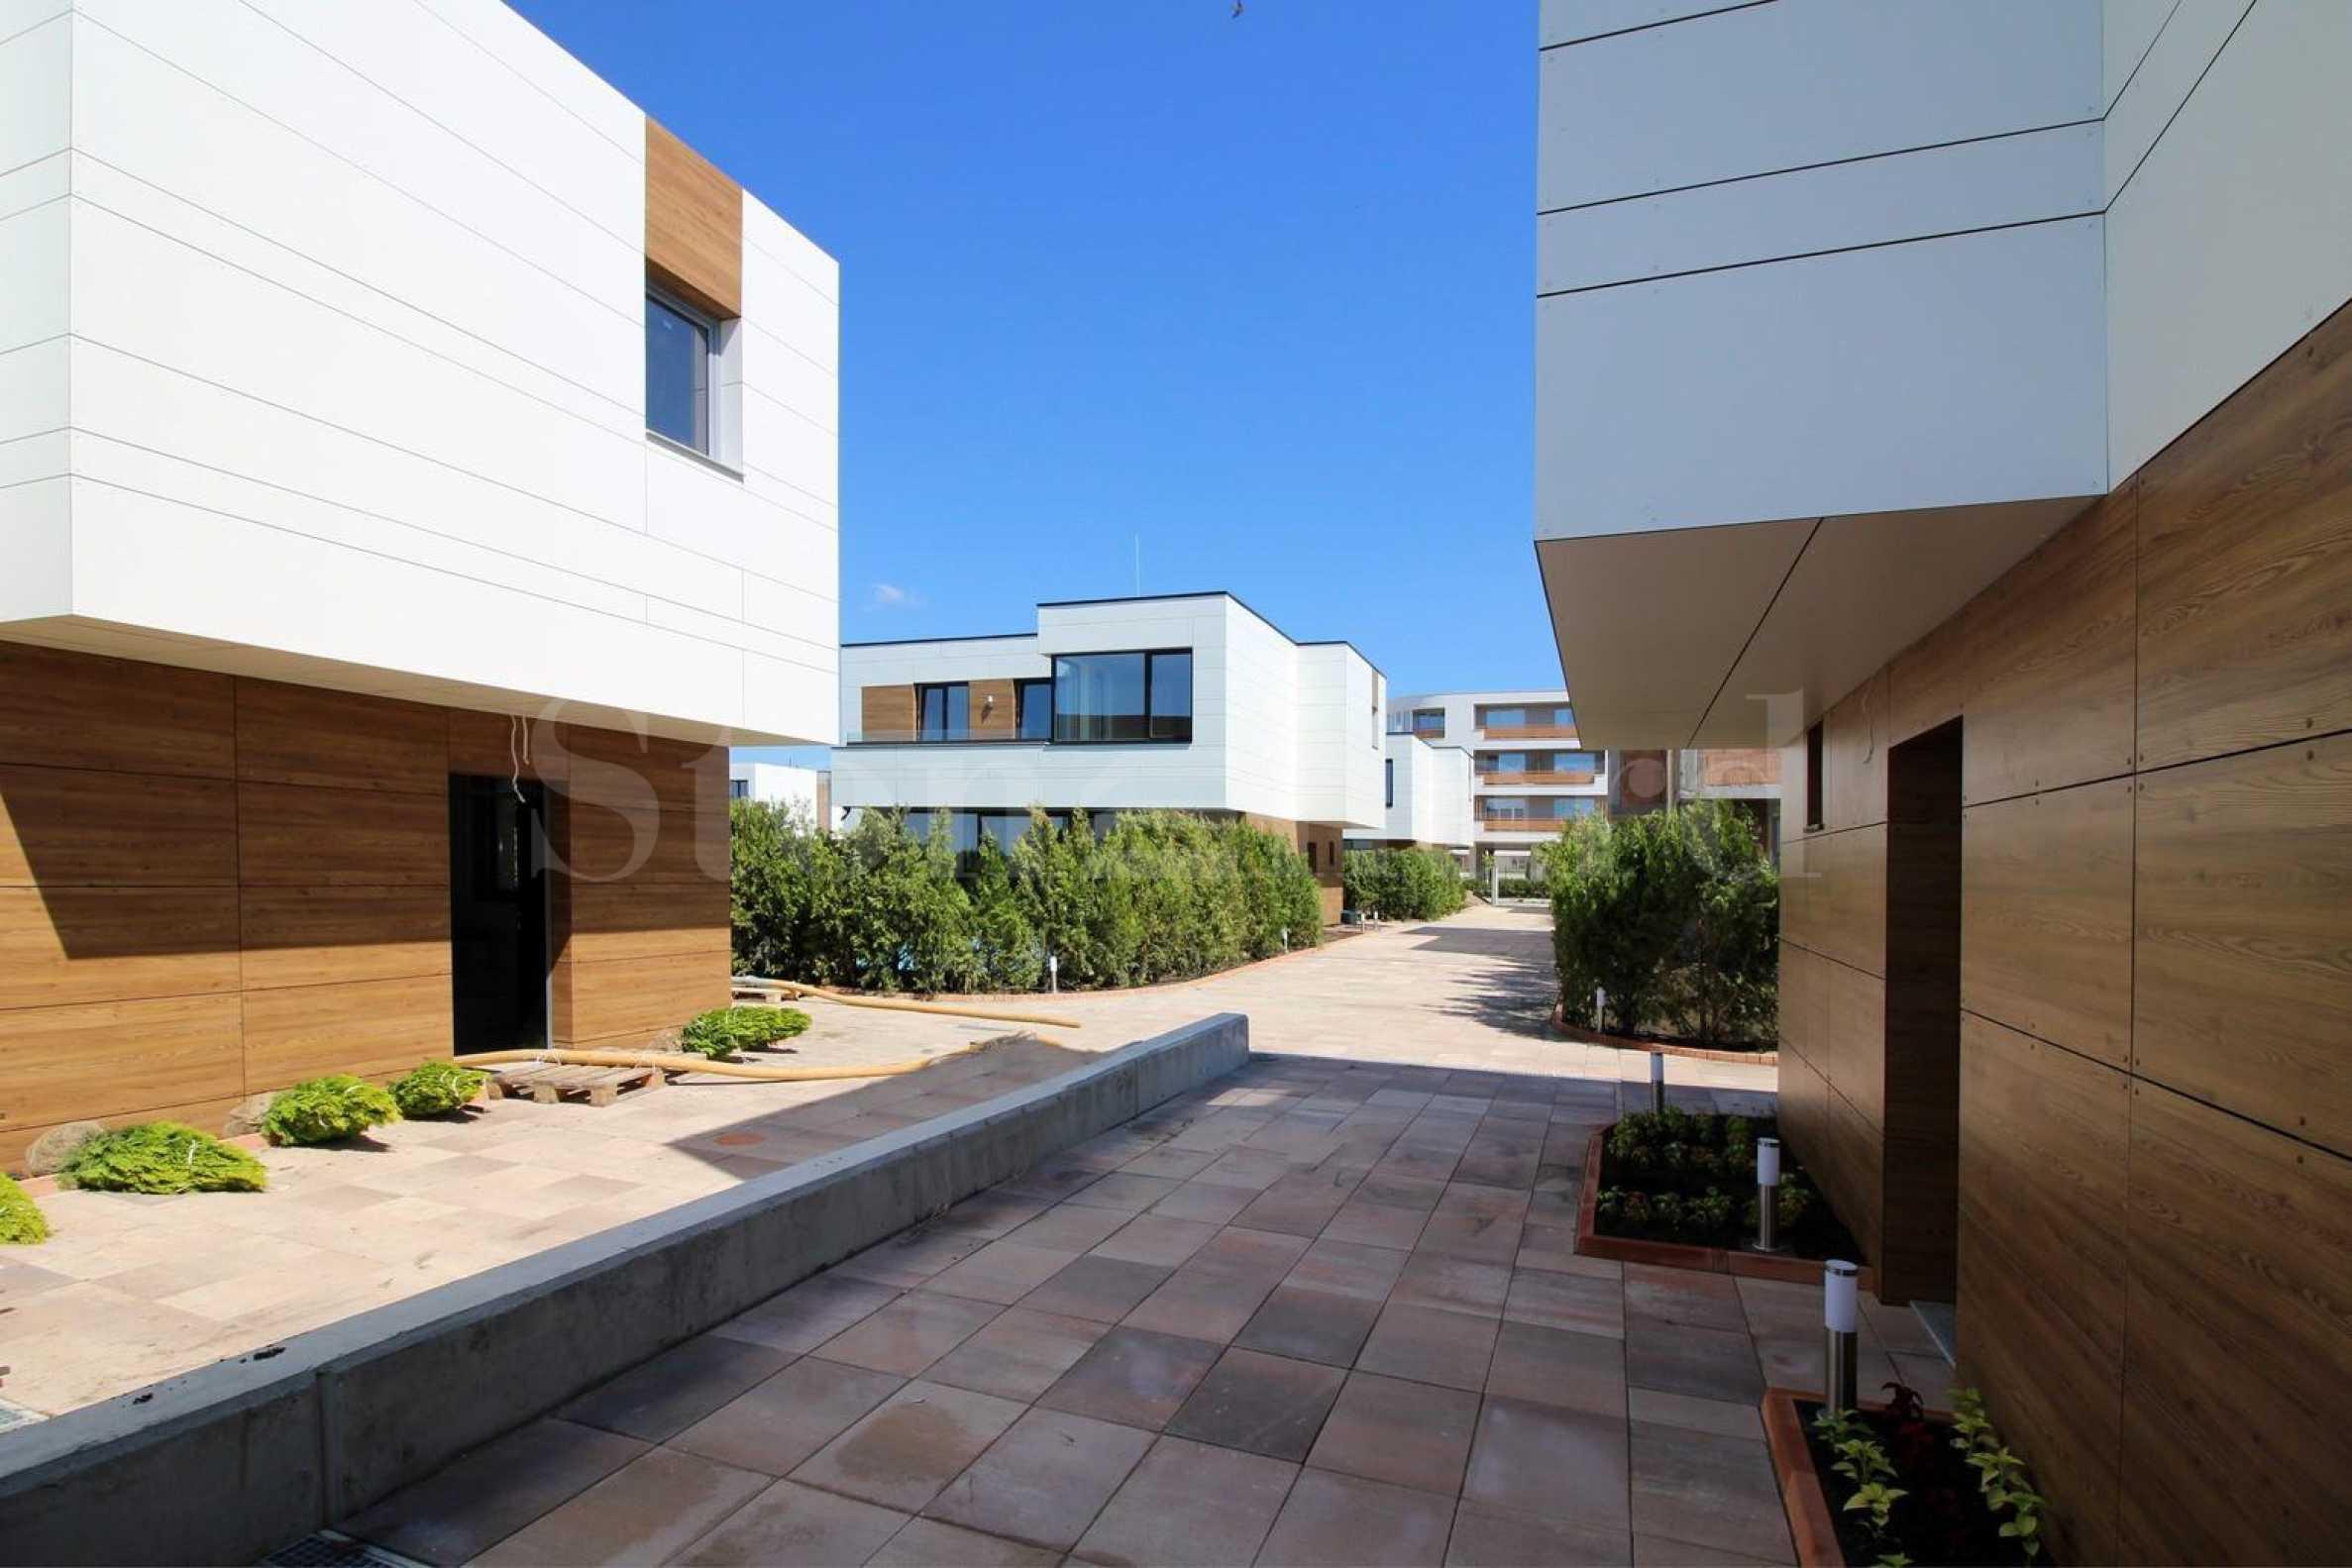 Luxury 2-storey house of a project in Sarafovo neighborhood in Burgas1 - Stonehard